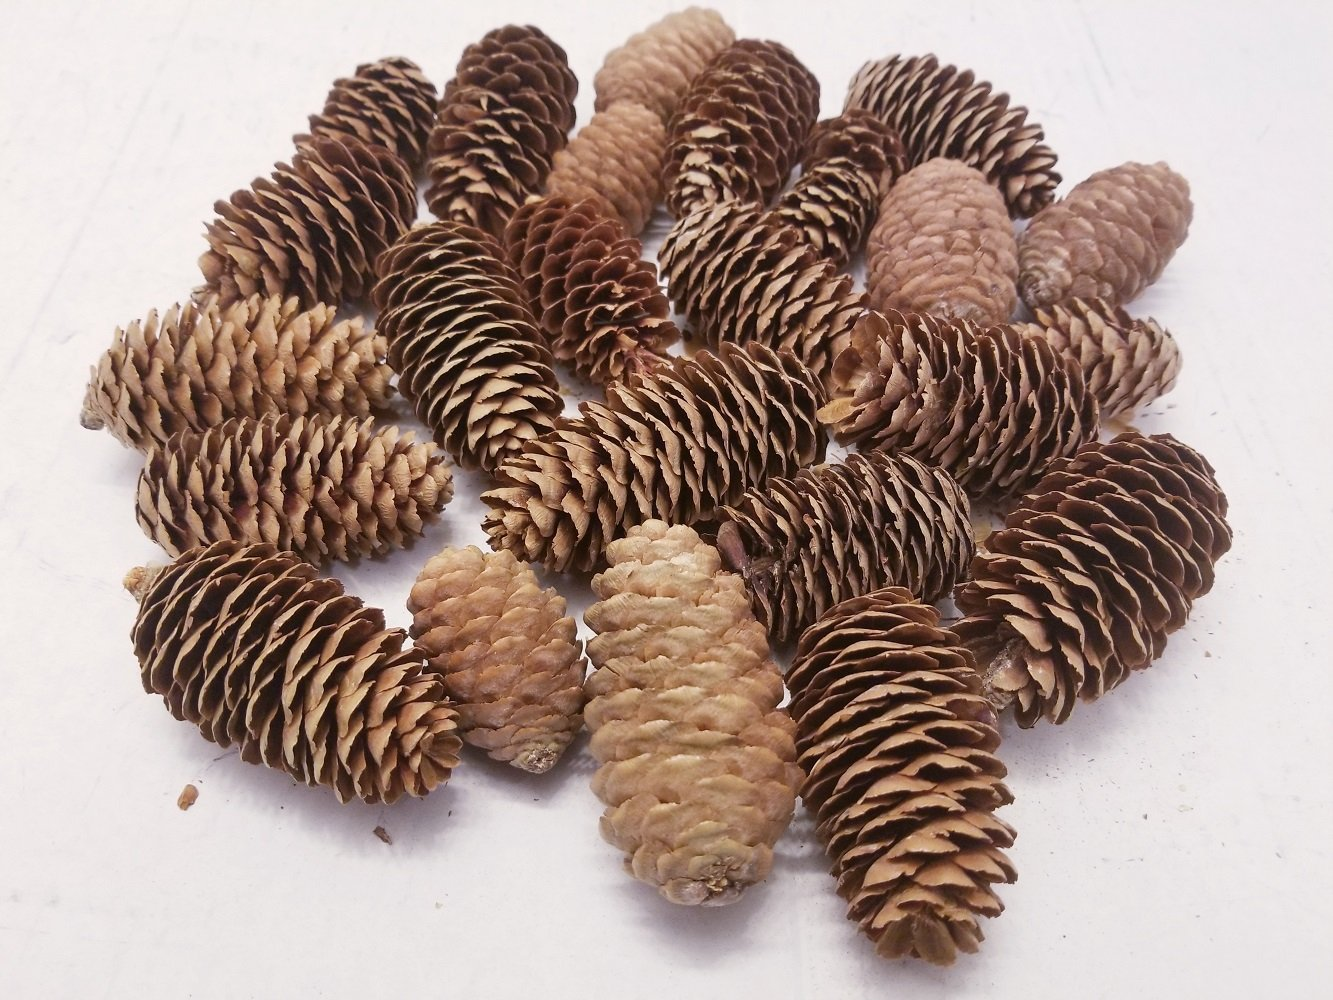 BCD Medium Pinecones - Bag Of 20-25 Medium Pinecones, Perfect For Crafting, Decorating Bowl Fillers